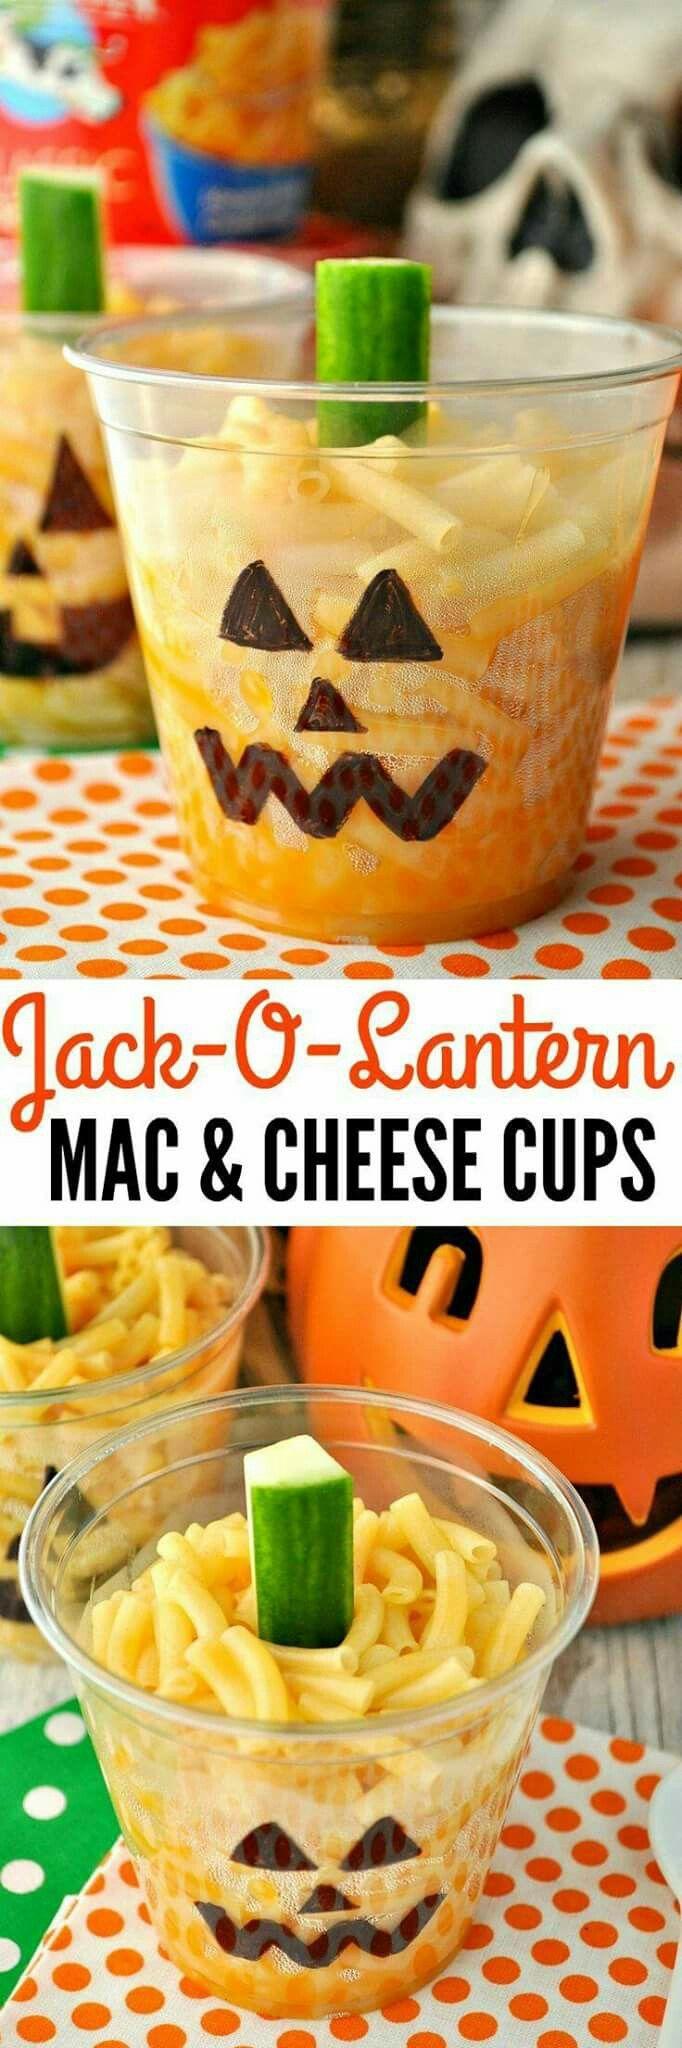 Jack-O-Lantern Mac & Cheese Cups